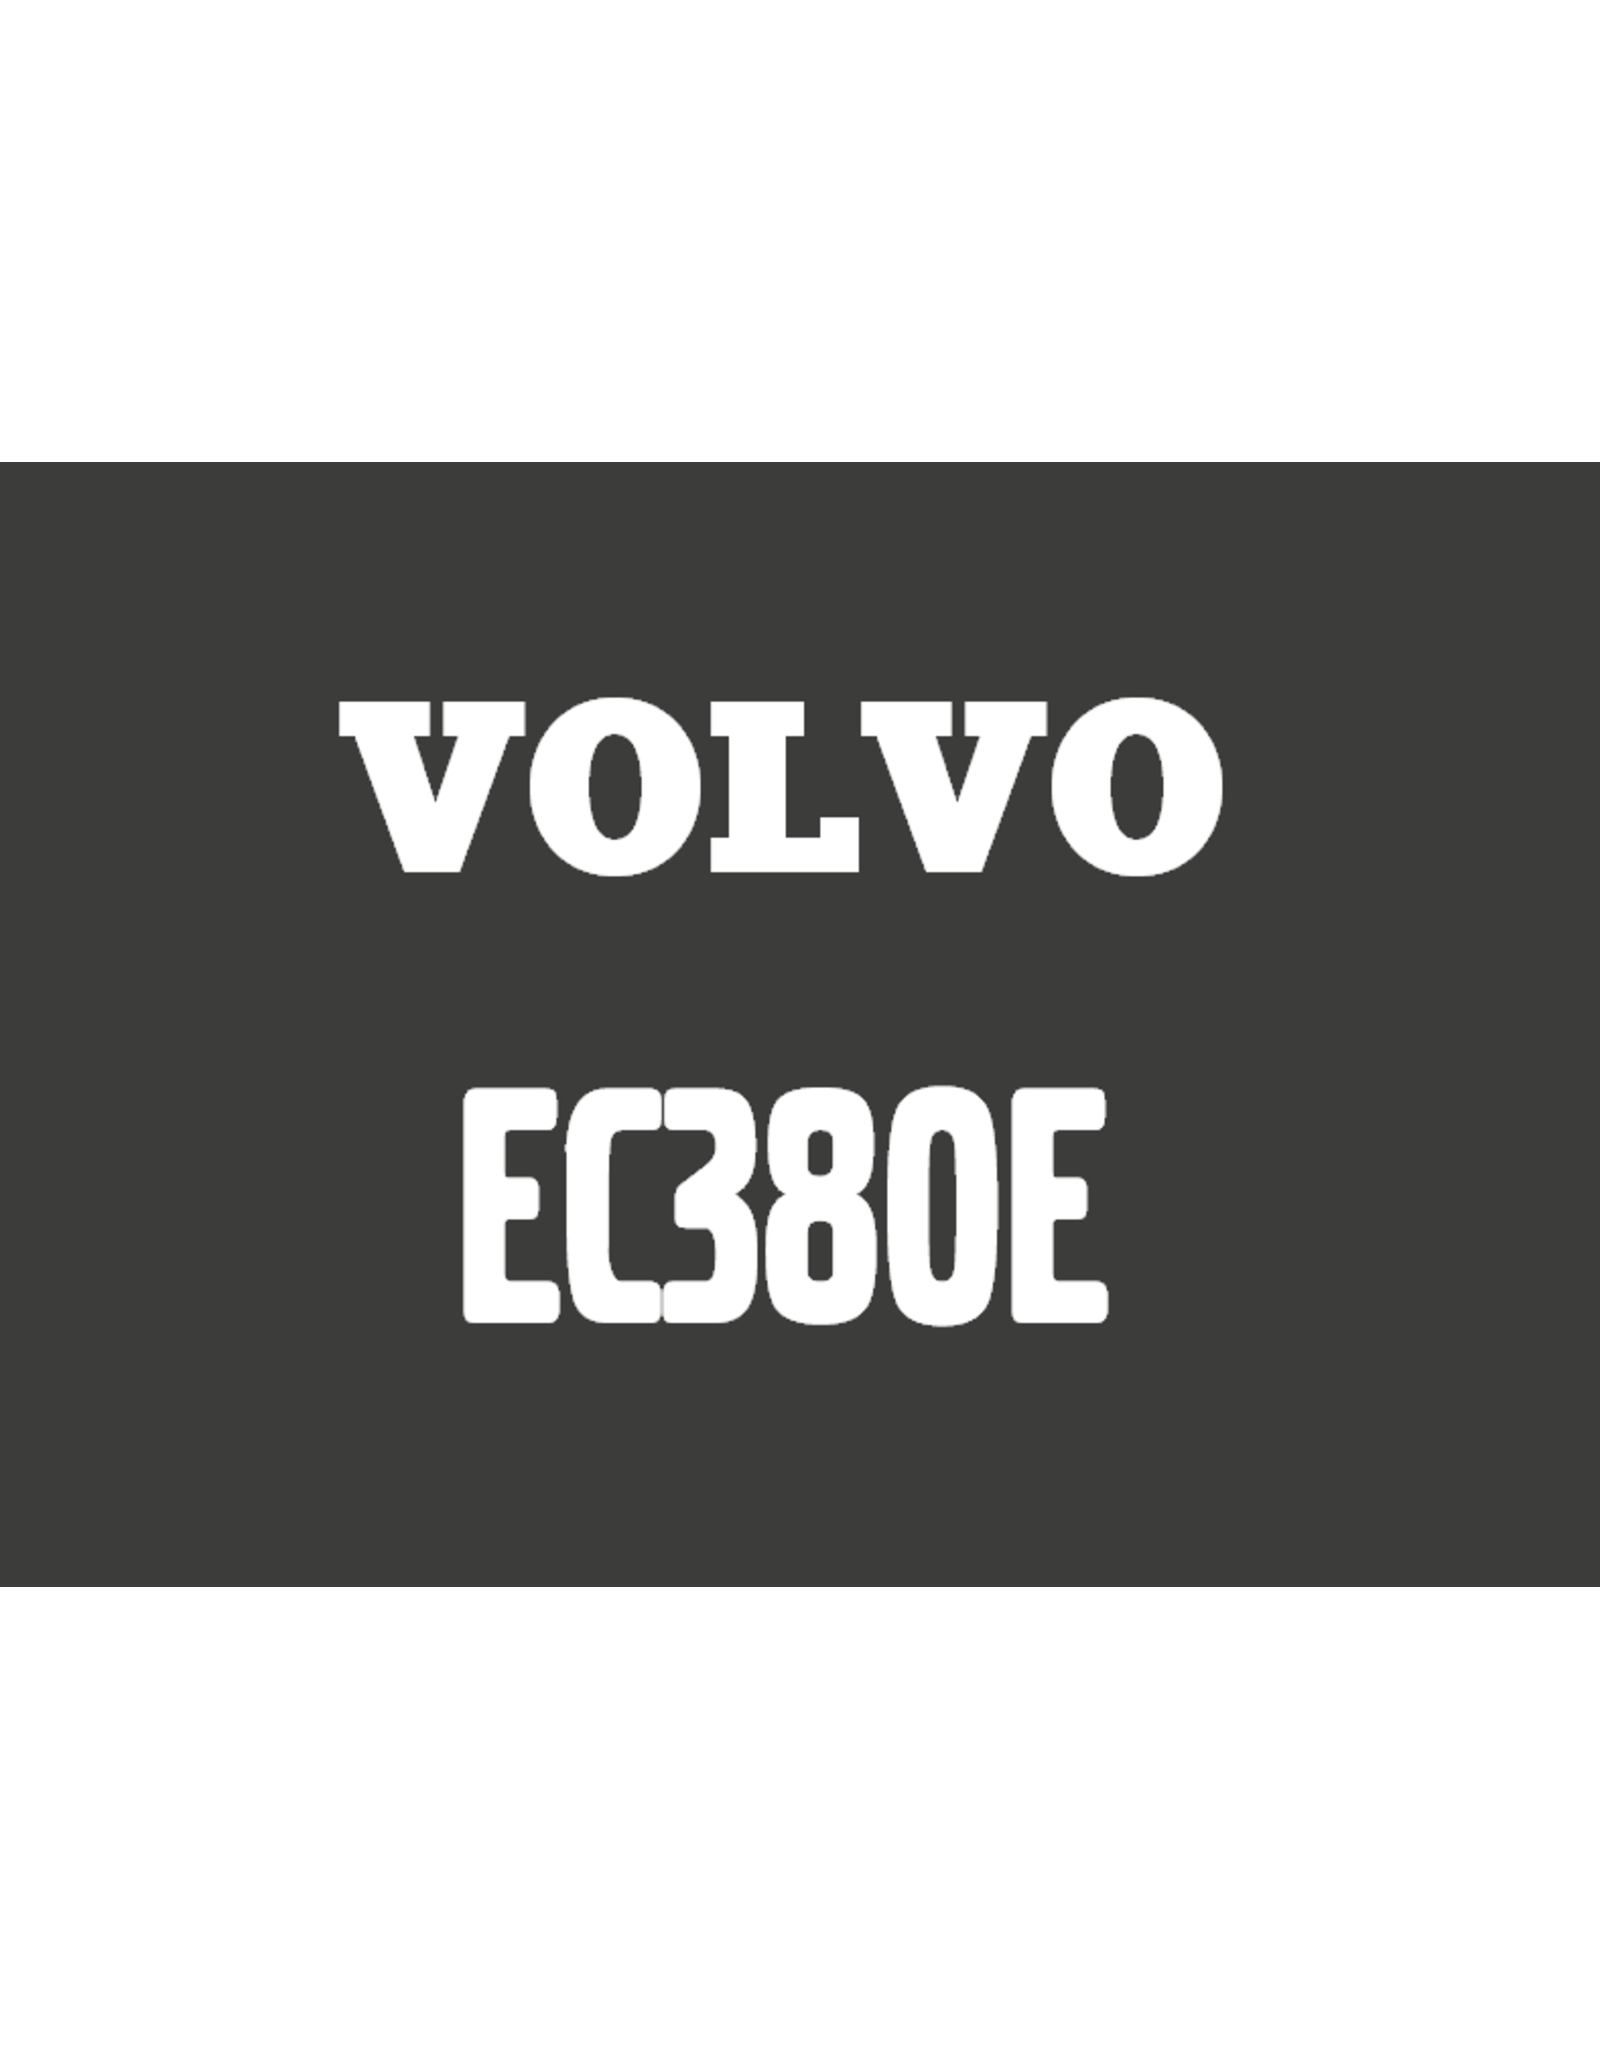 Echle Hartstahl GmbH FOPS für Volvo EC380E